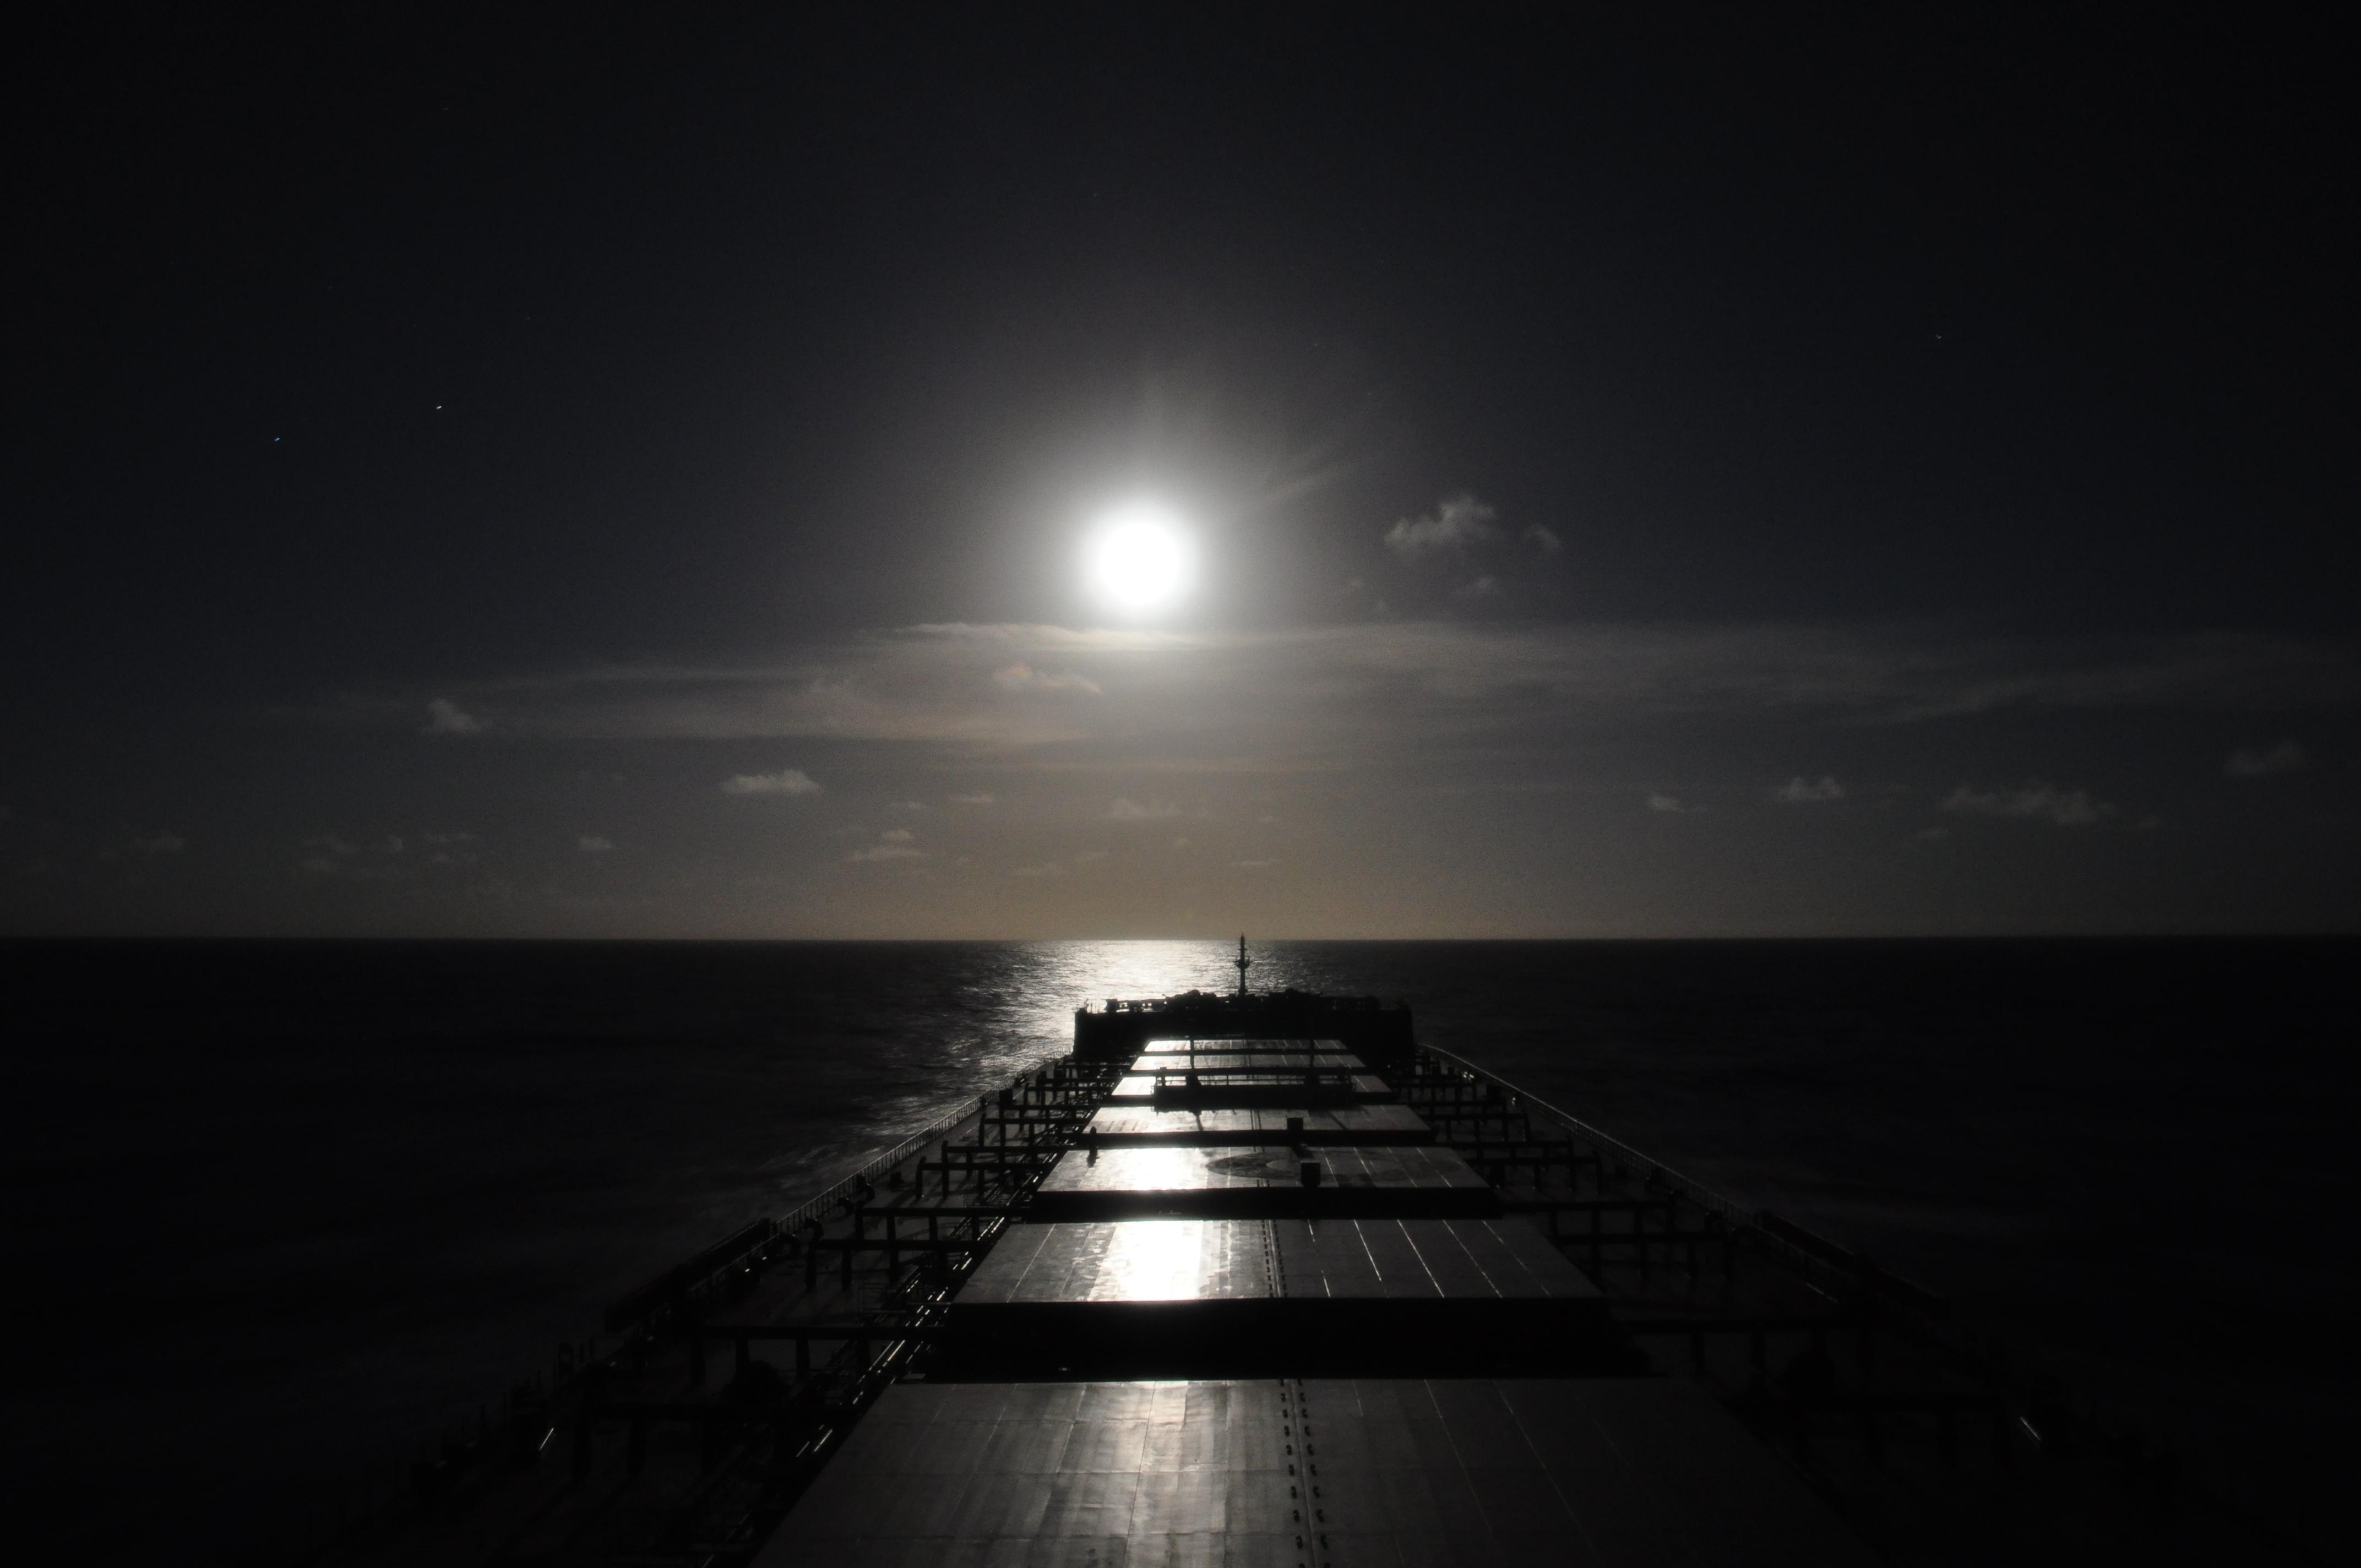 Vessel in Moonlight